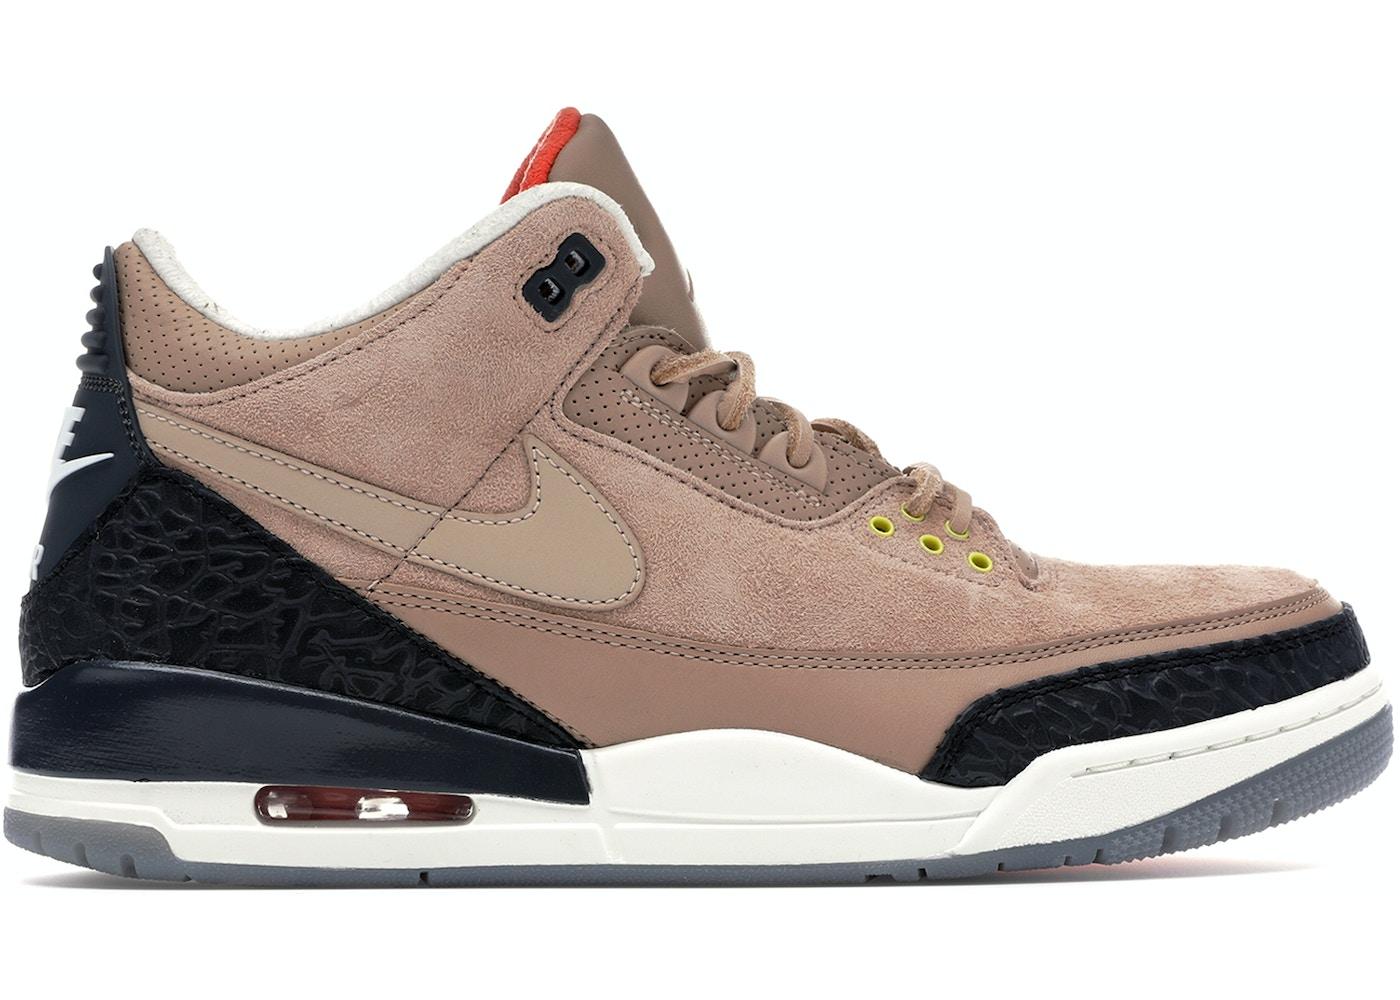 separation shoes 0d957 92aaf Jordan 3 Retro JTH Bio Beige - AV6683-200